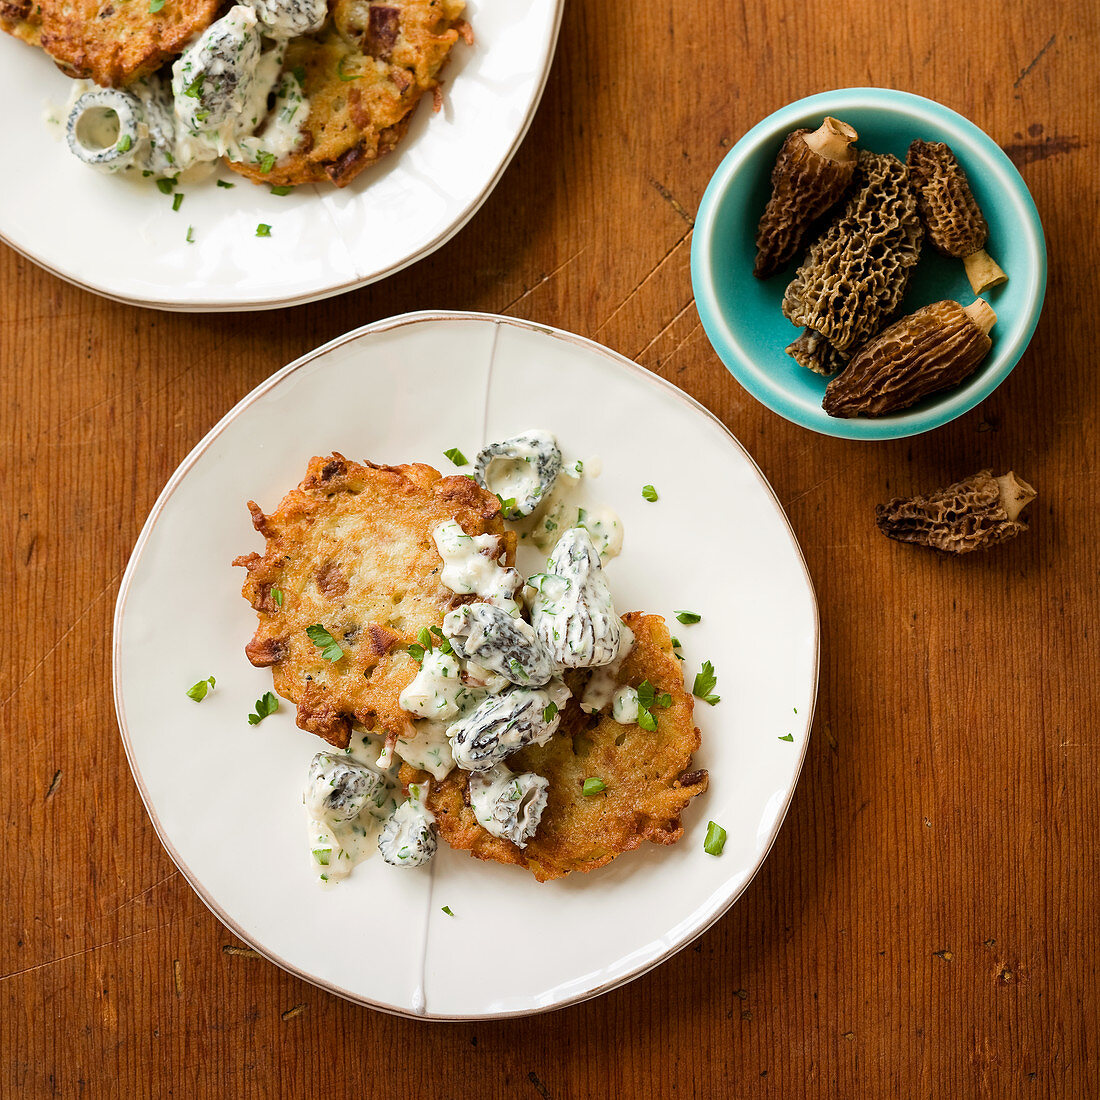 Creamed Morel Mushrooms witih Potato and Chanterelle Mushroom Latkes